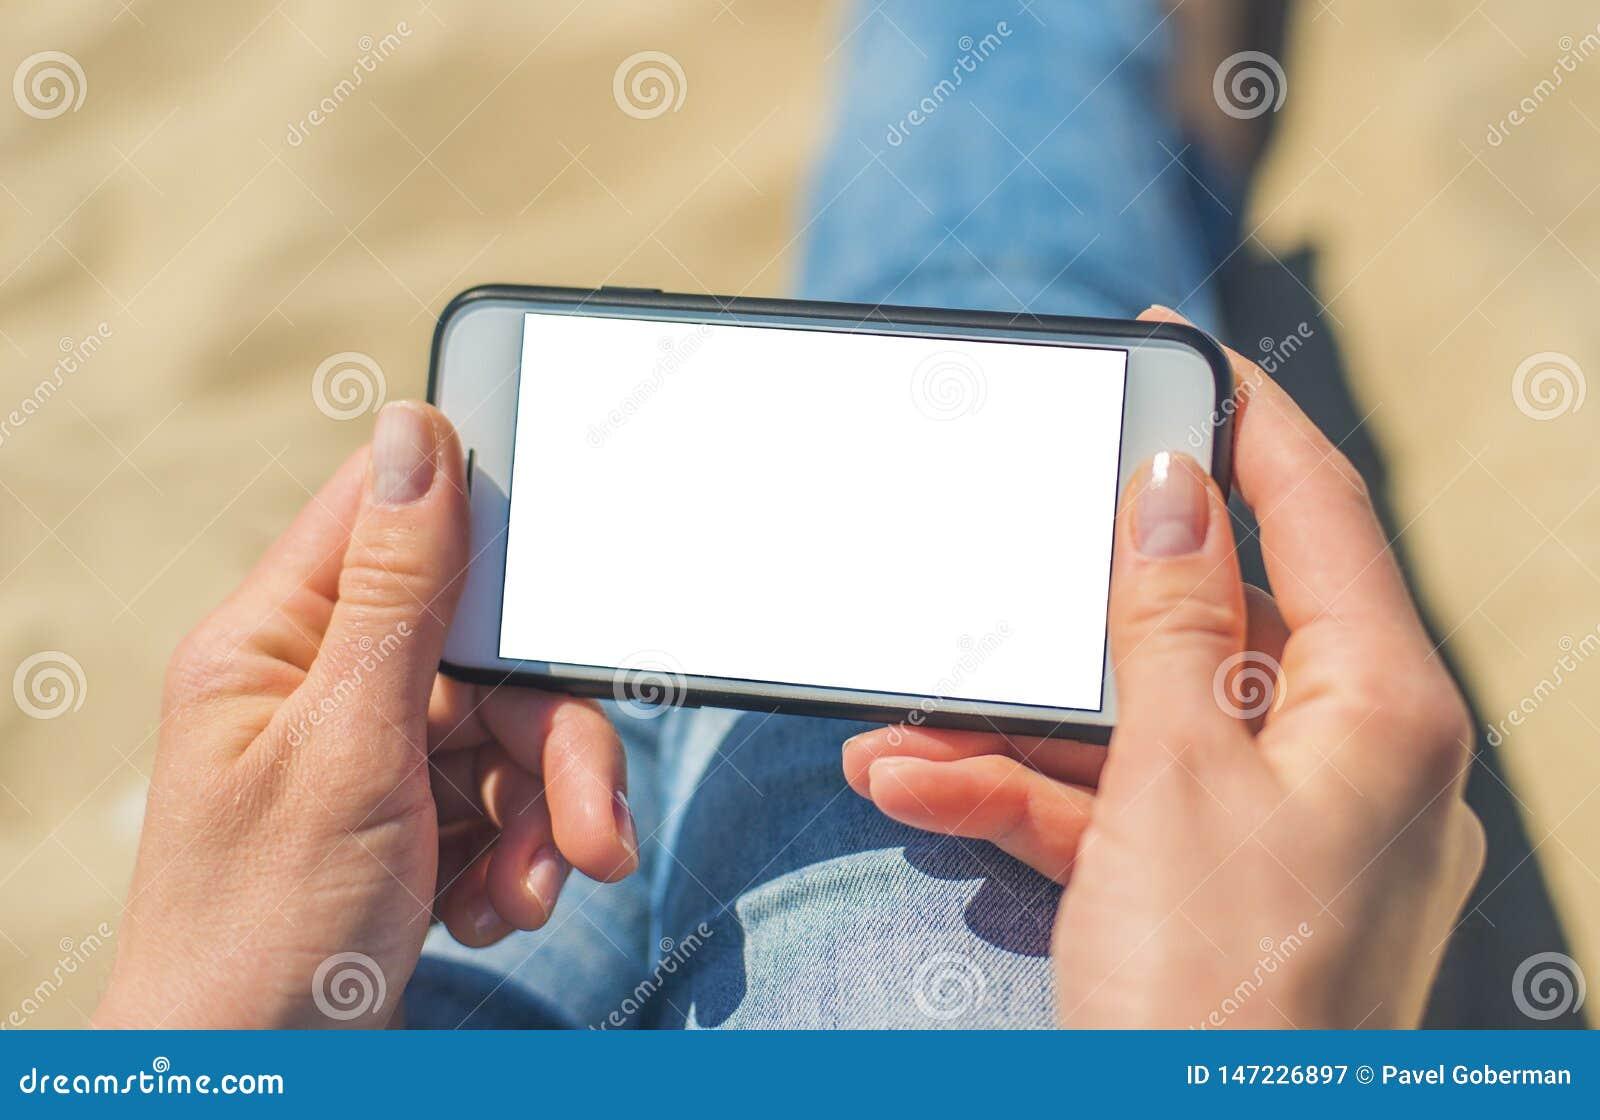 En kvinna som rymmer en vit mobiltelefon med en tom sk?rm